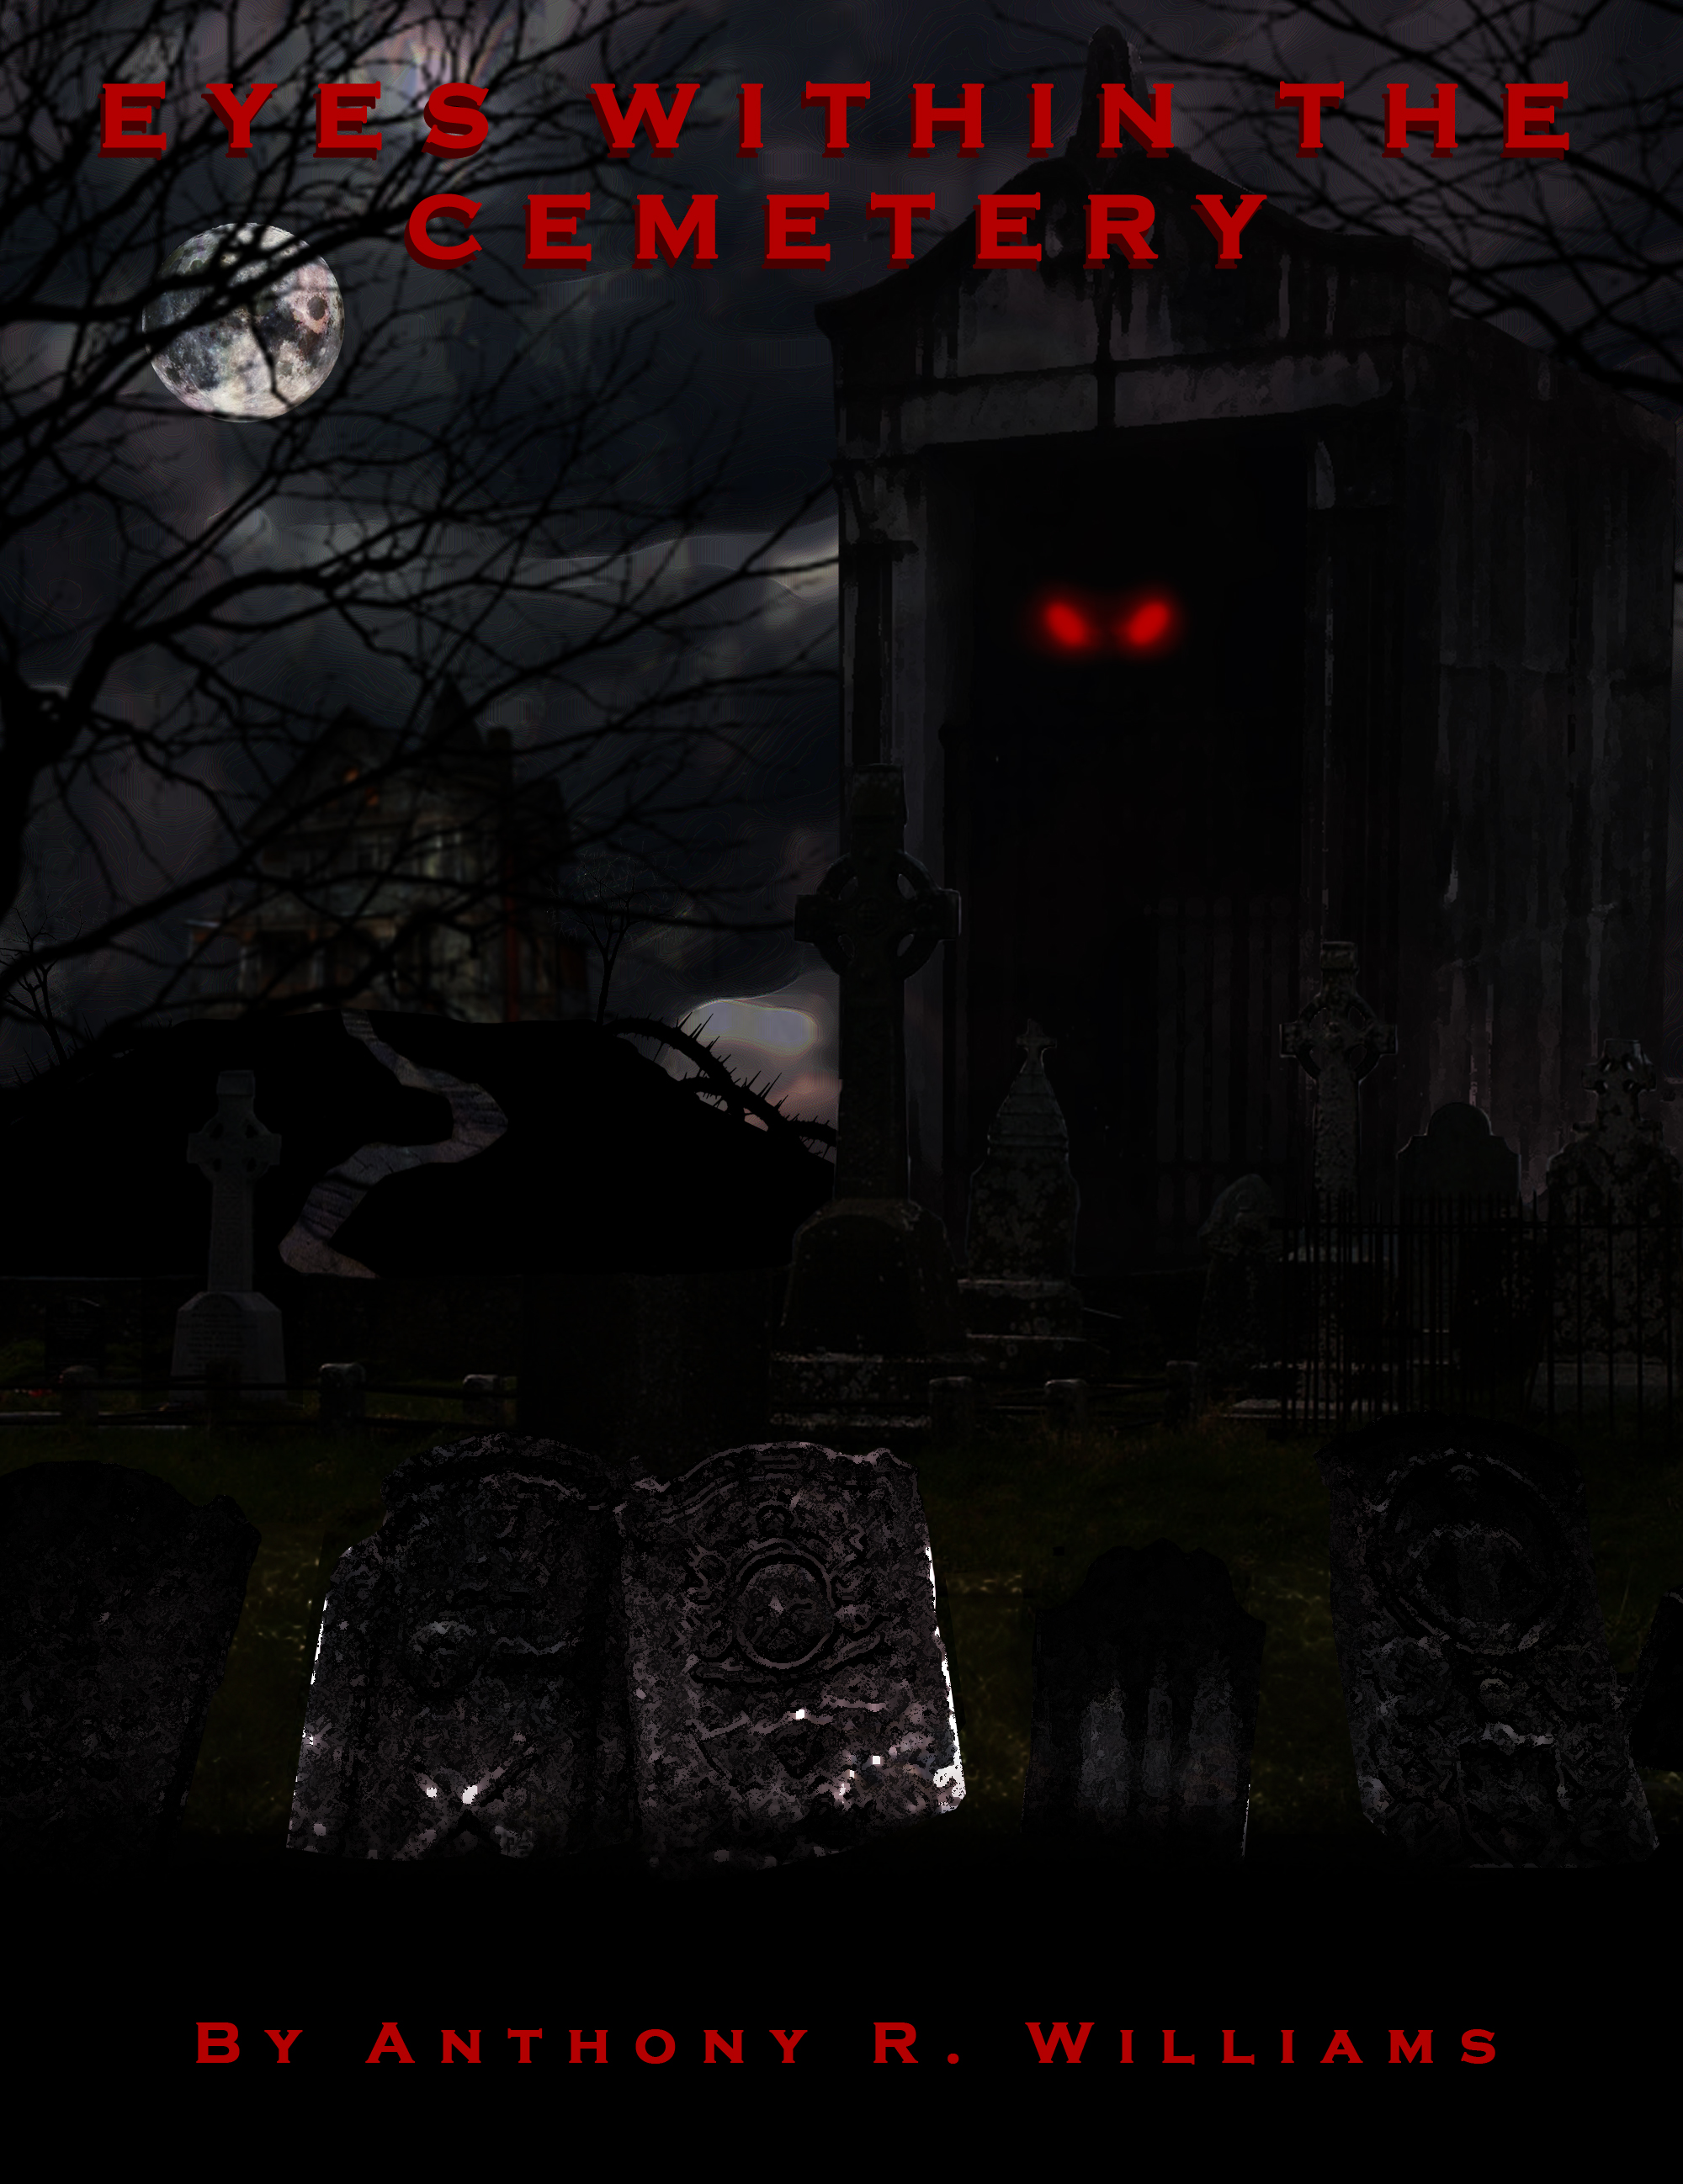 Eyes_Within_the_Cemetery_V2.jpg